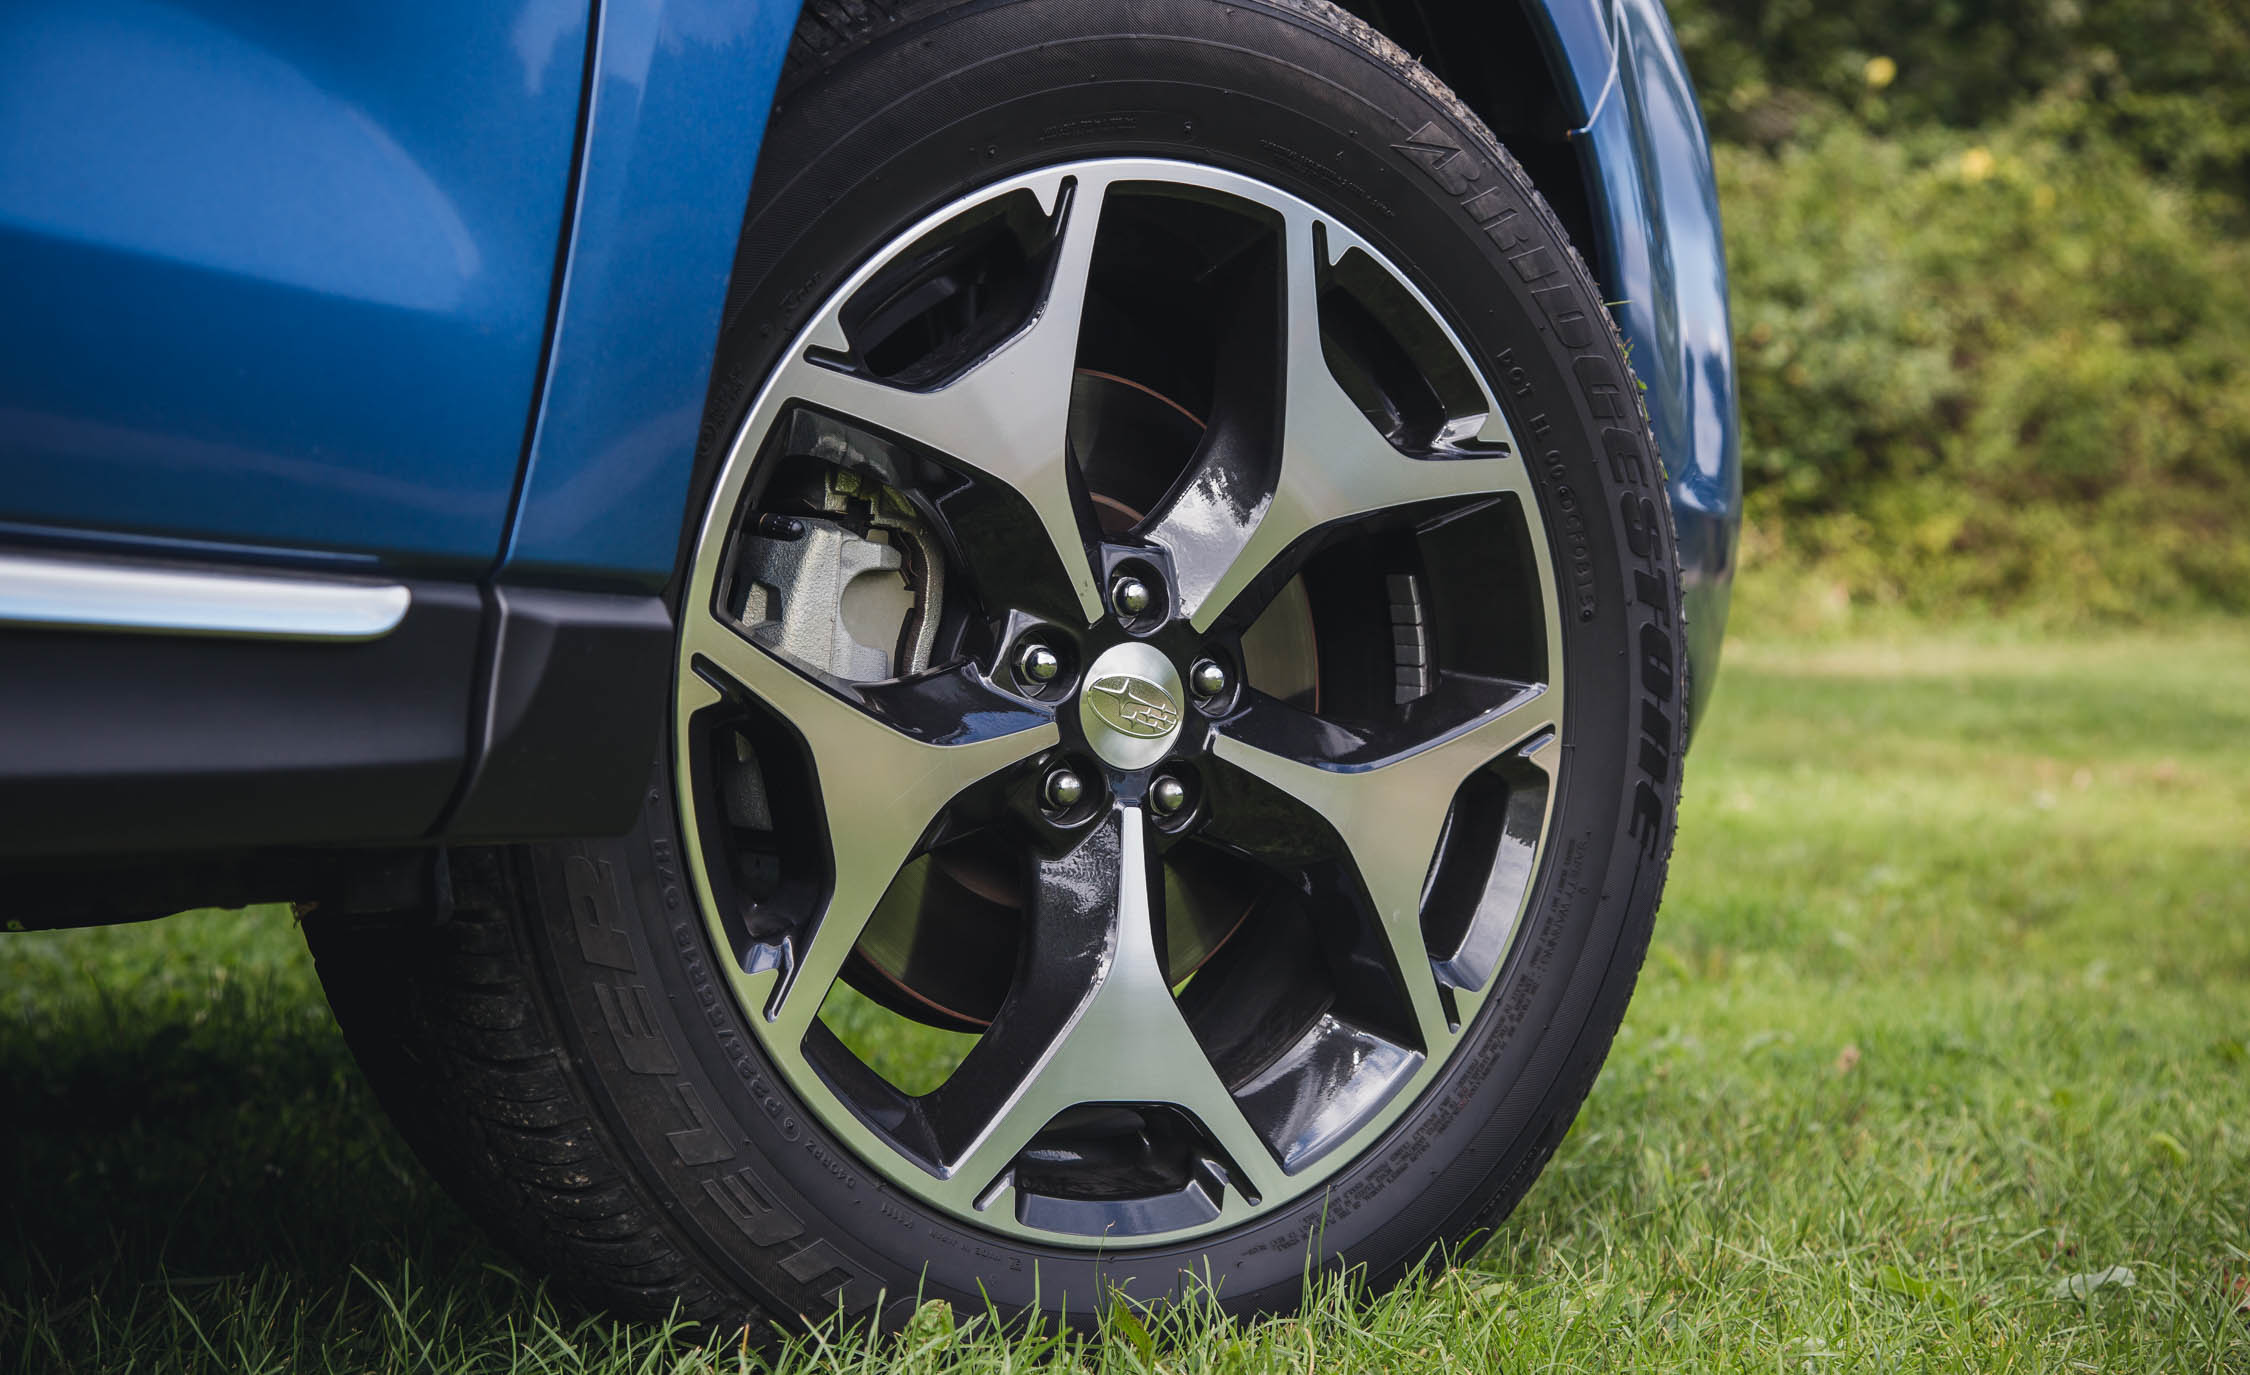 2016 Subaru Forester 2.0XT Touring Exterior Wheel